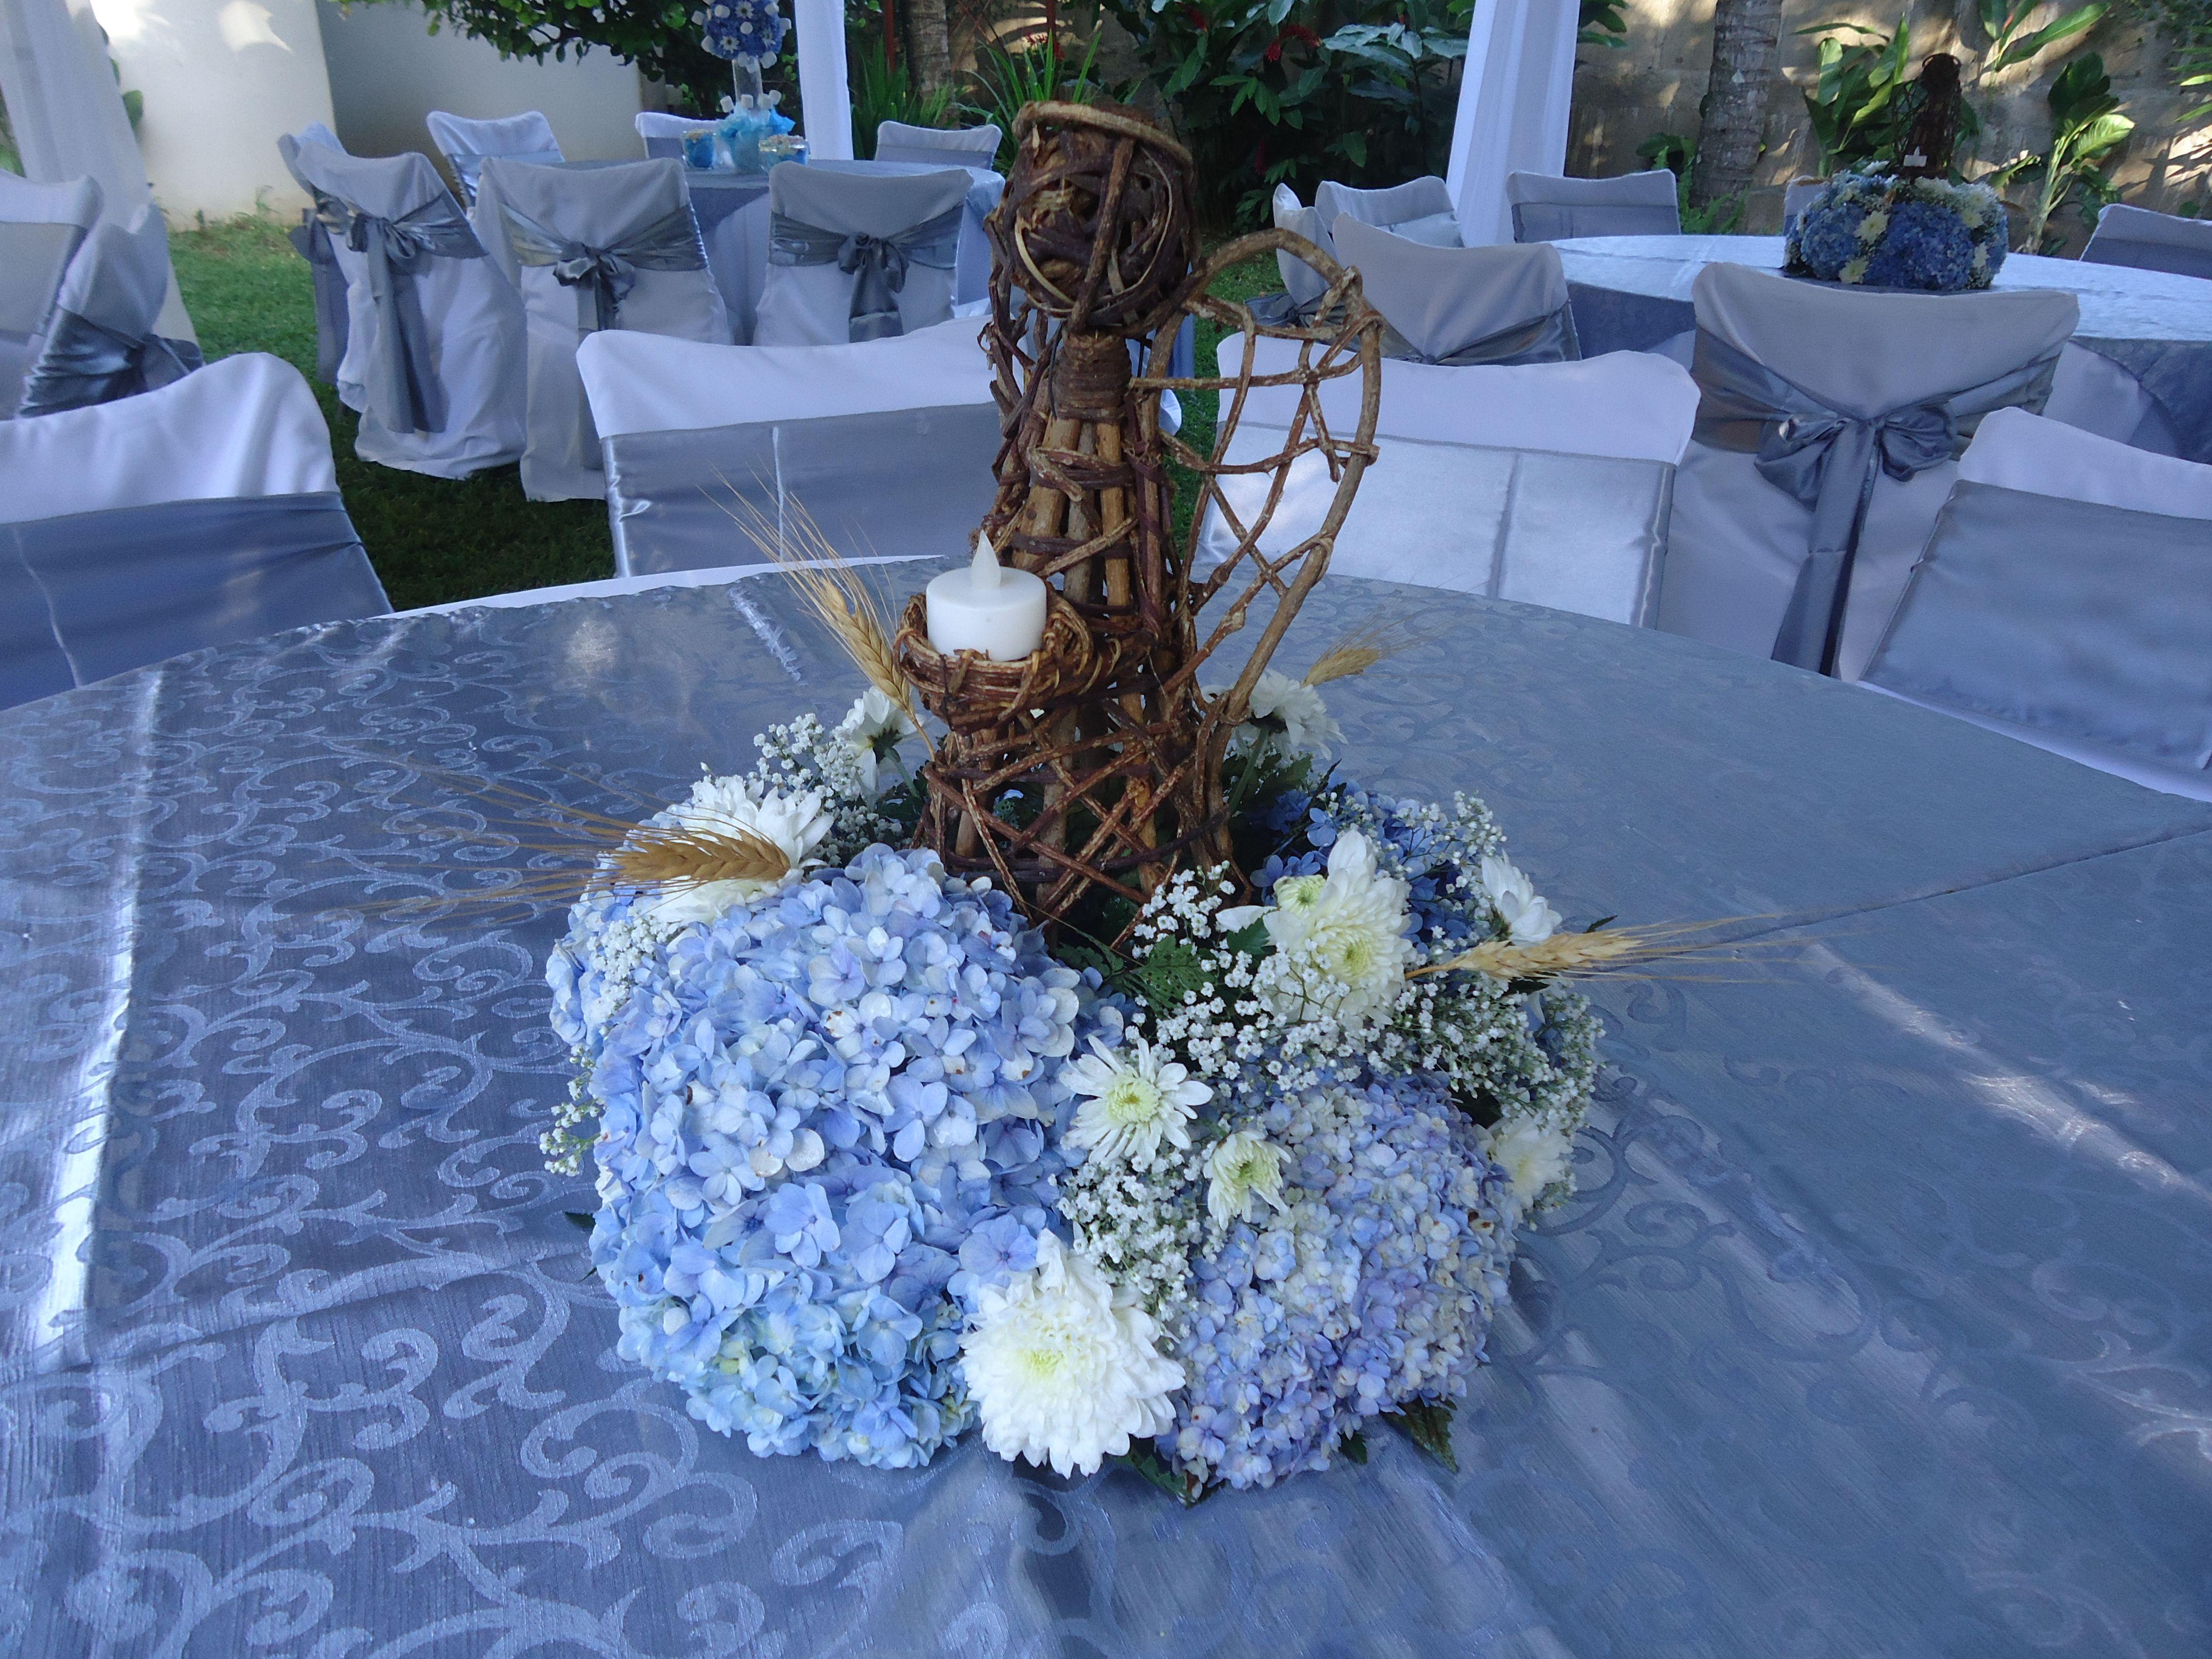 Centro de mesa primera comuni n decoraciones fiestas pinterest communion ideas para - Centros de mesa para primera comunion originales ...